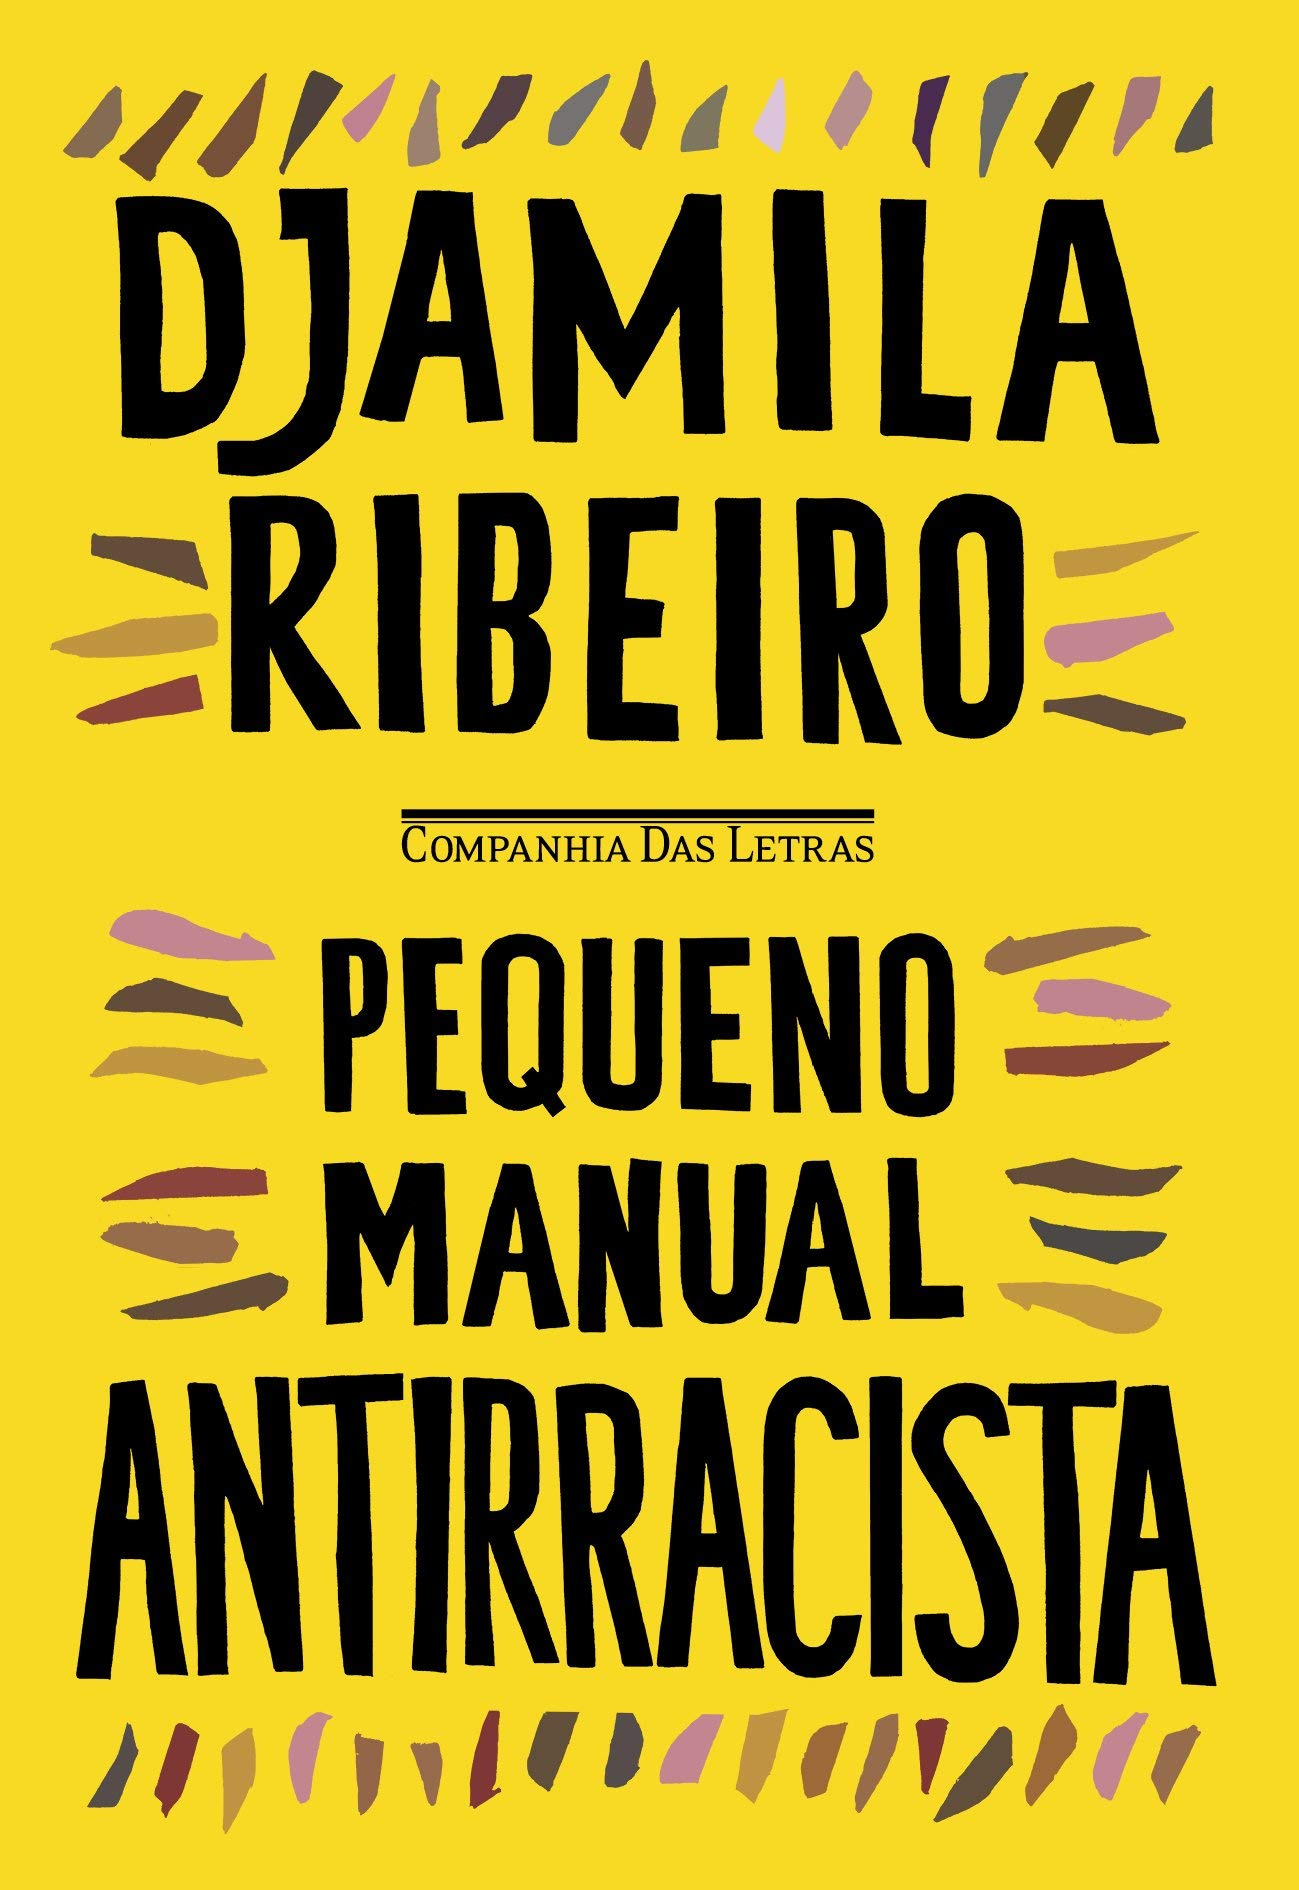 Pequeno manual antirracista | Amazon.com.br